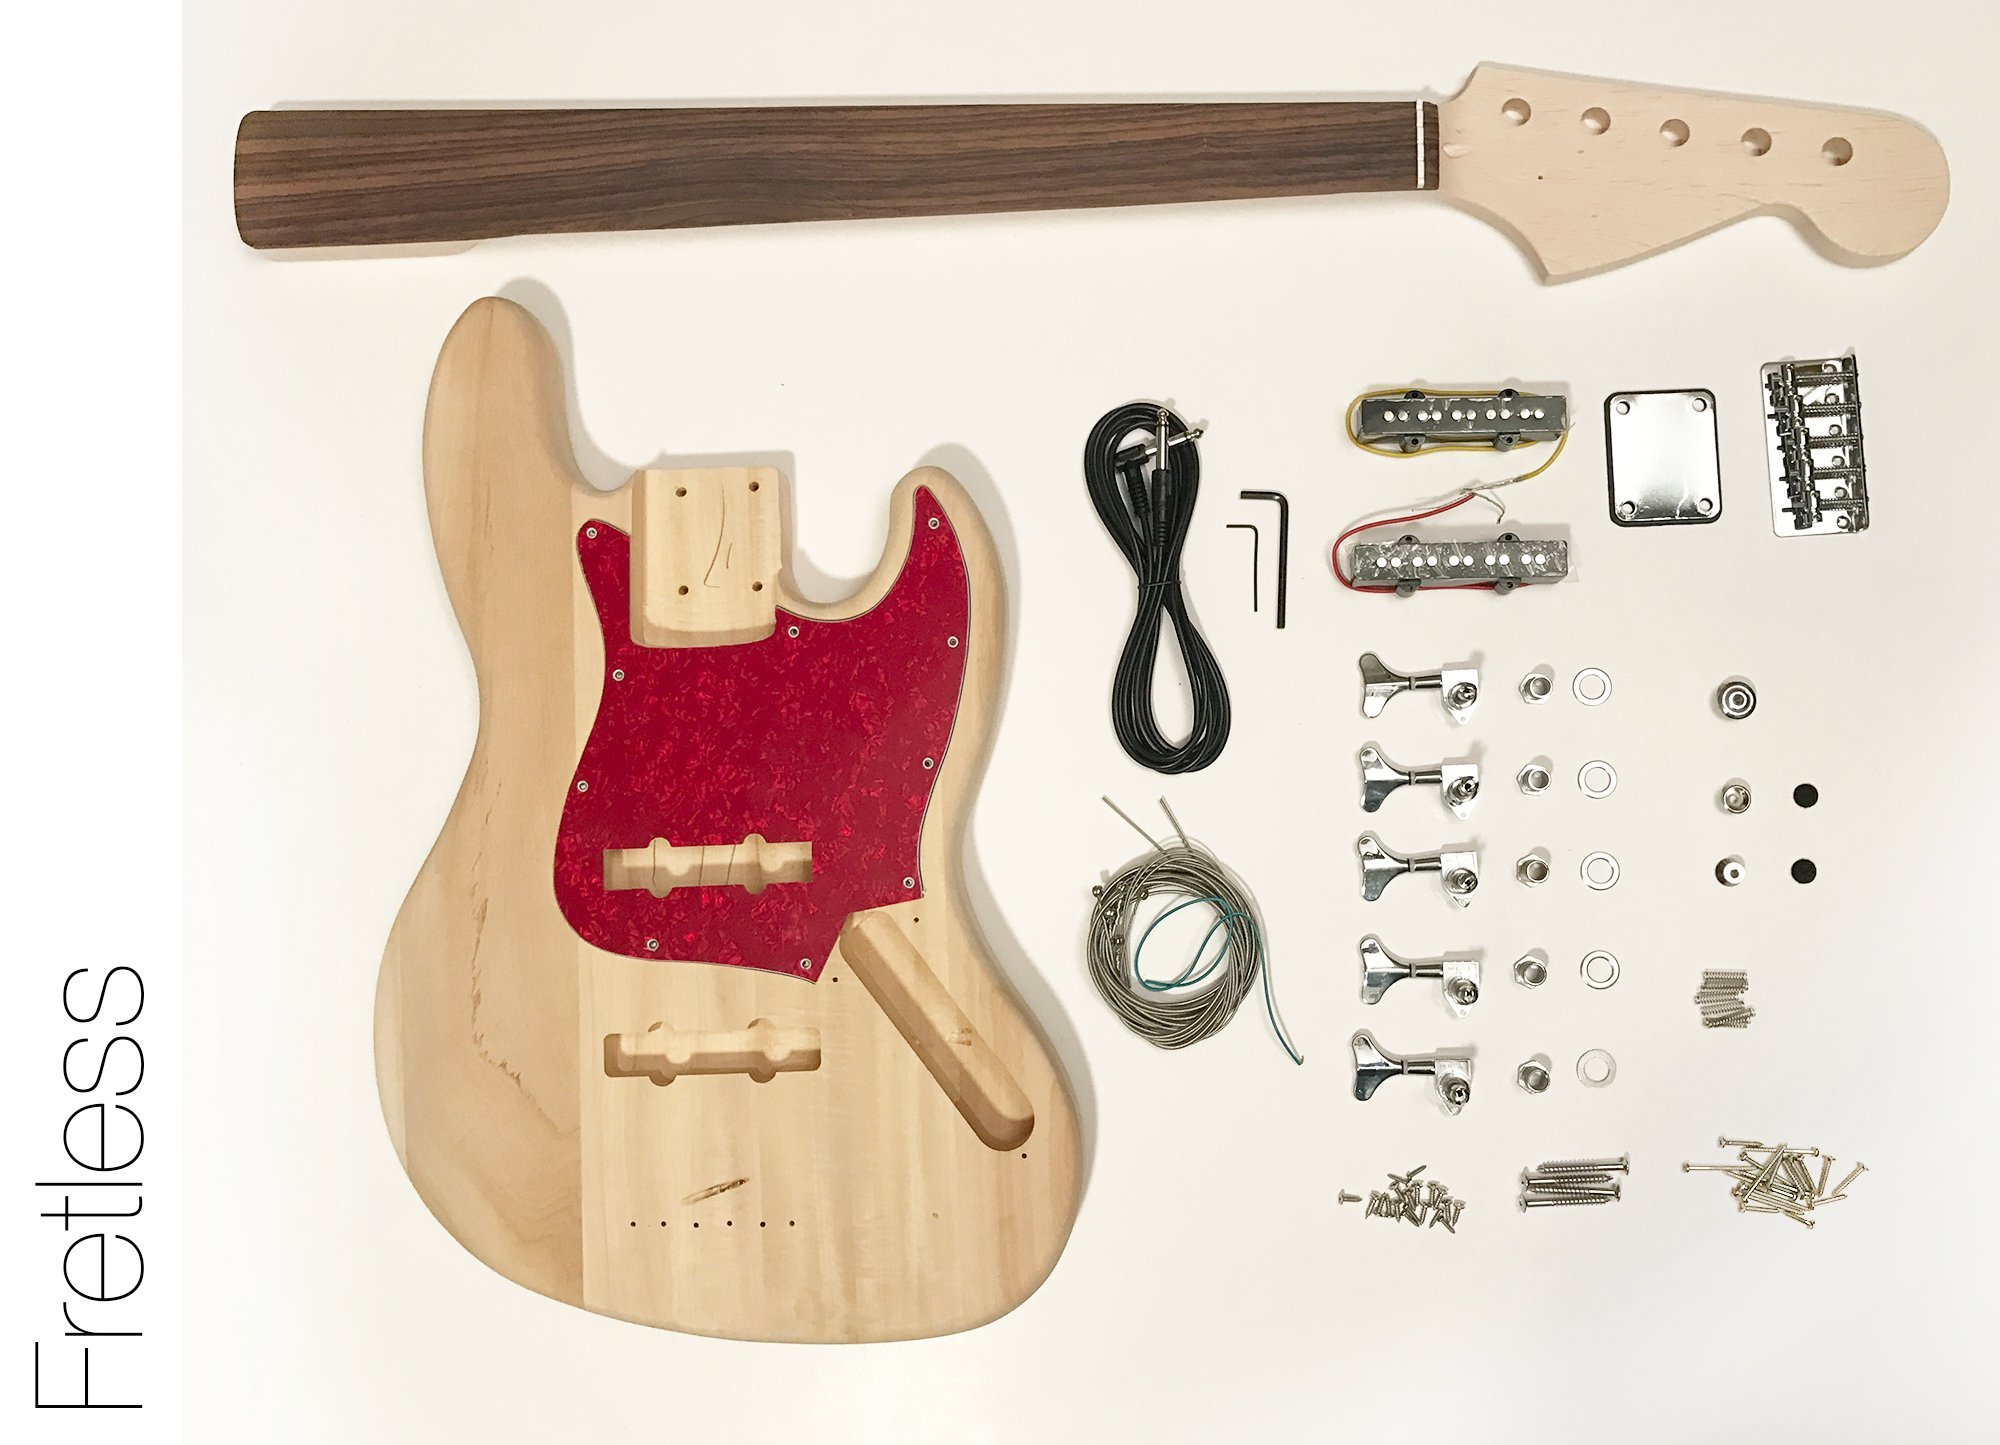 Cheap DIY Electric Bass Guitar Kit - Fretless 5 String J Bass Build Your Own Black Friday & Cyber Monday 2019